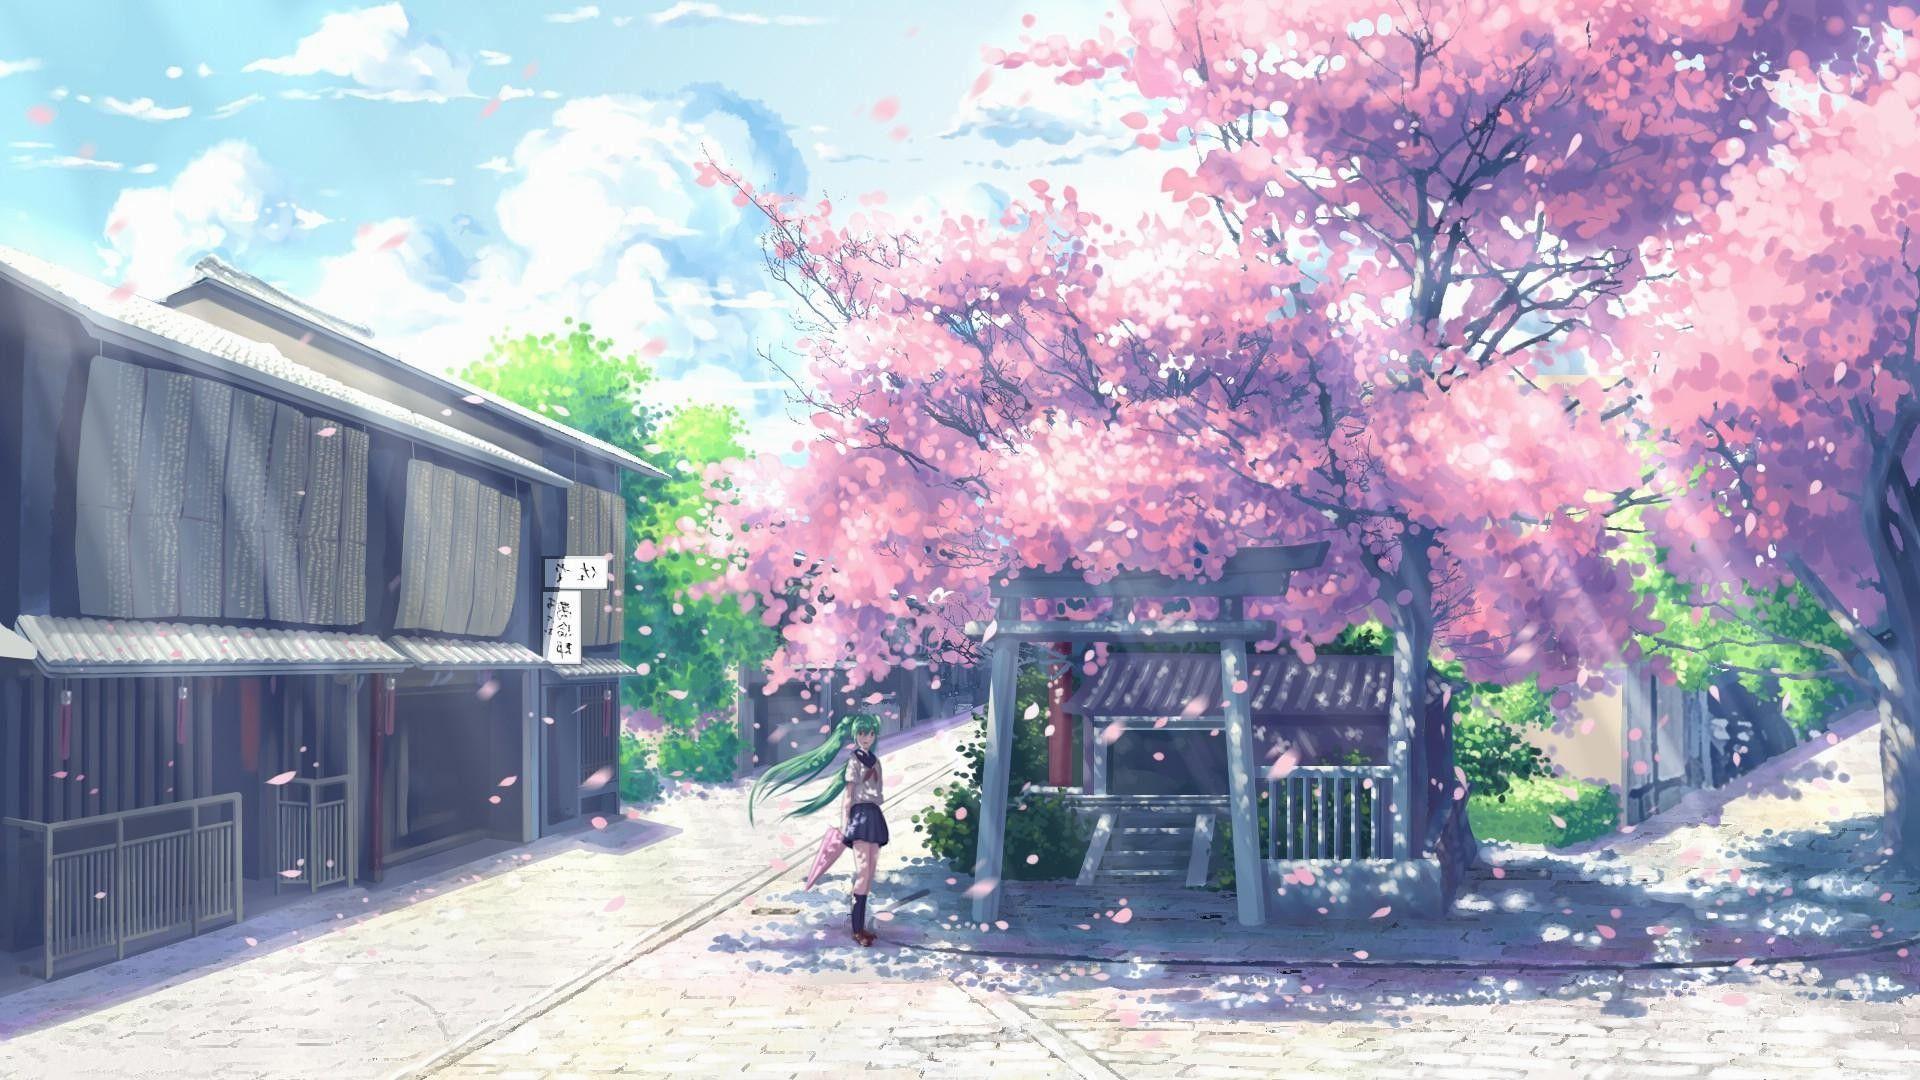 Anime Cherry Blossom Images